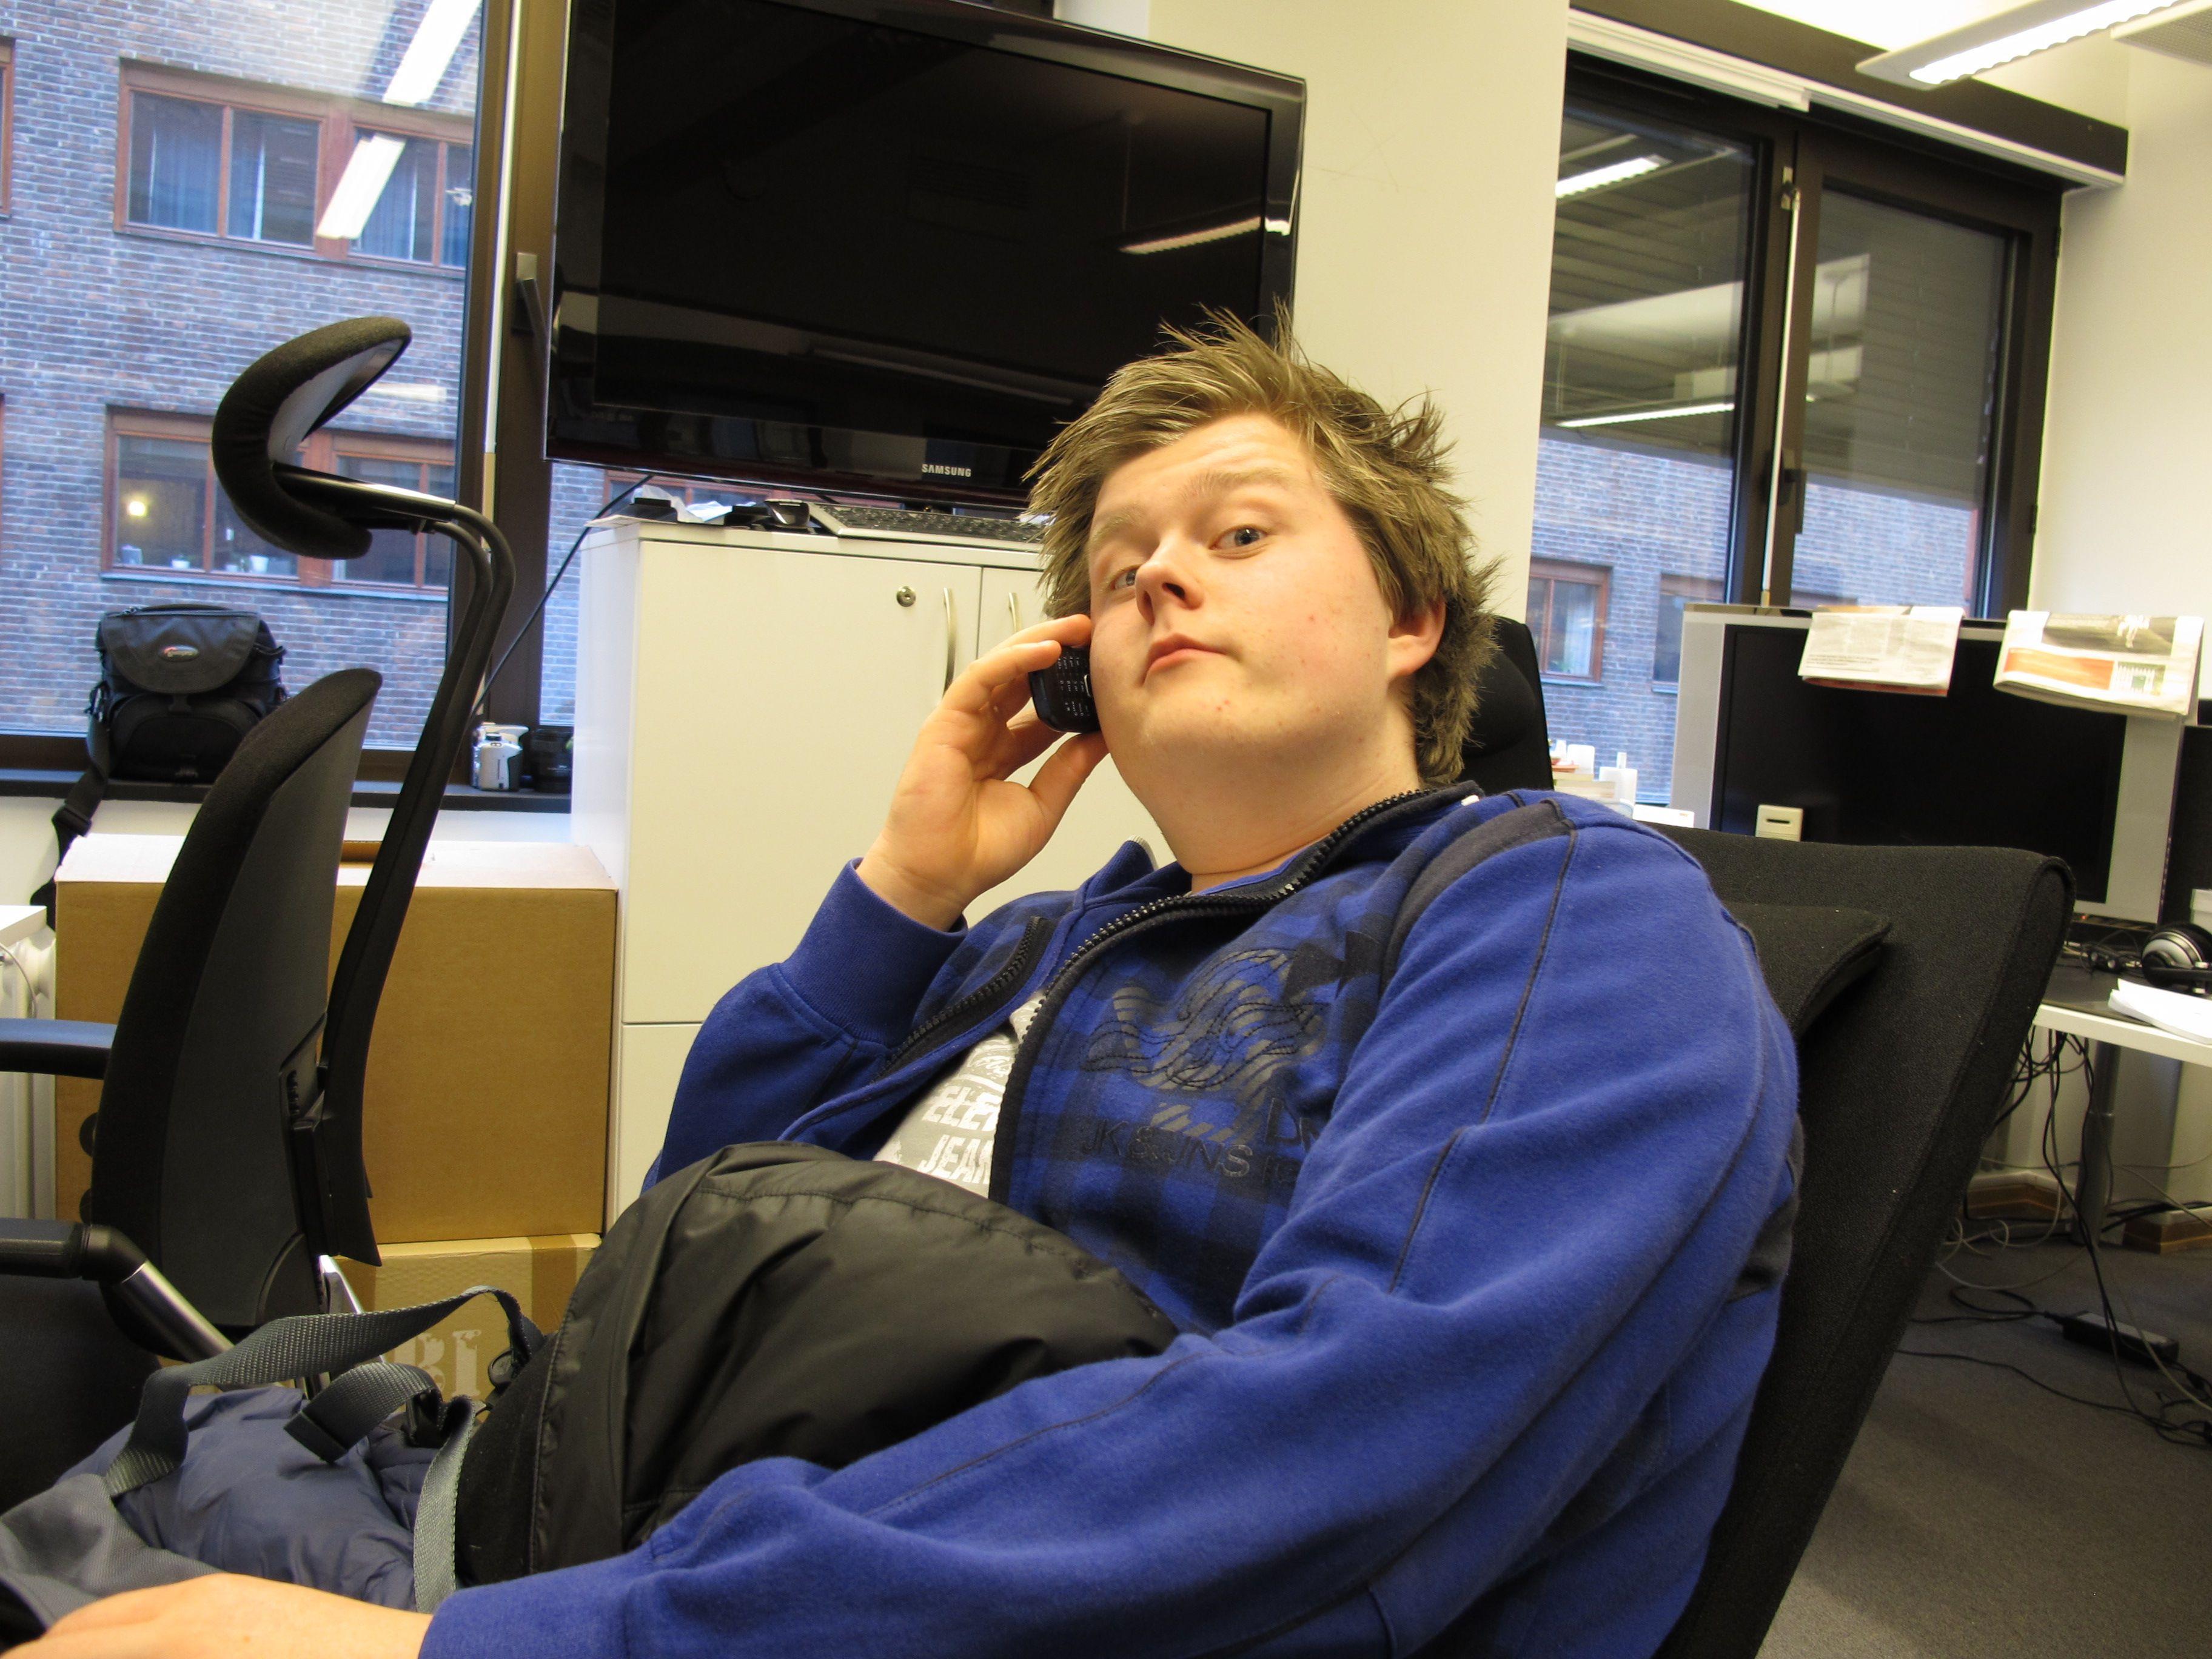 Telefon i arbeidstida, Håvard?